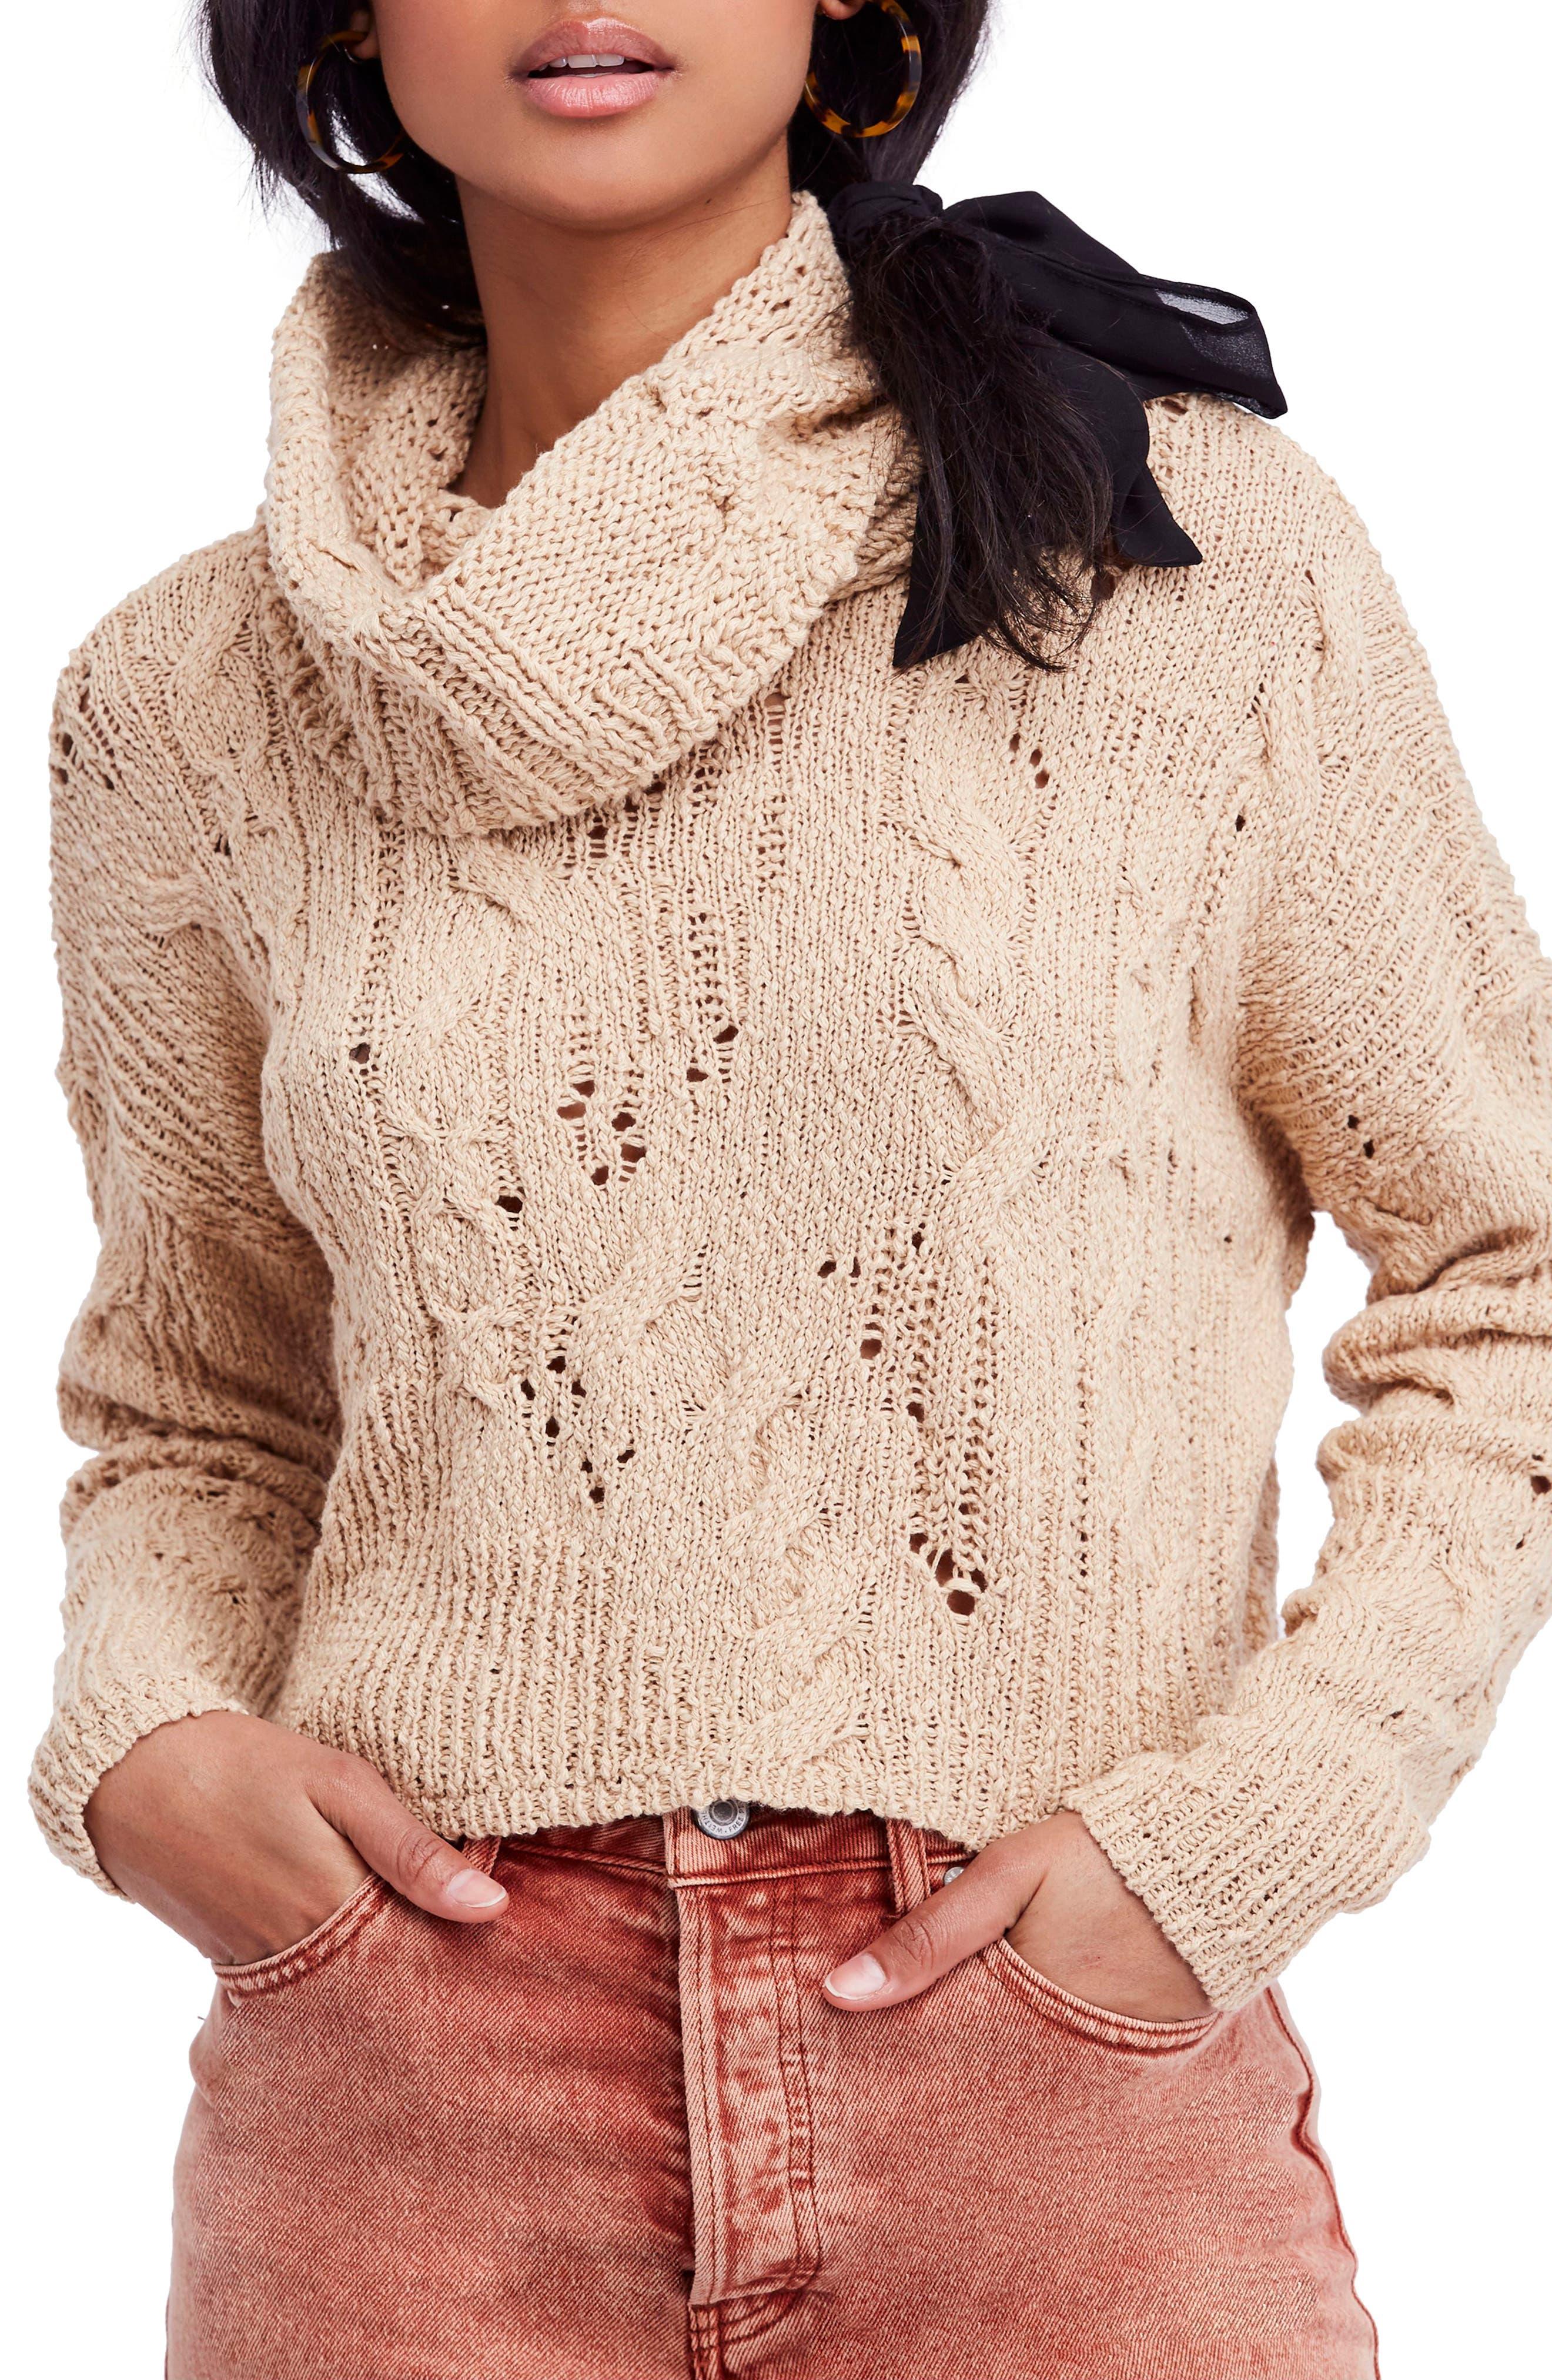 Shades of Dawn Crop Sweater,                             Main thumbnail 1, color,                             250